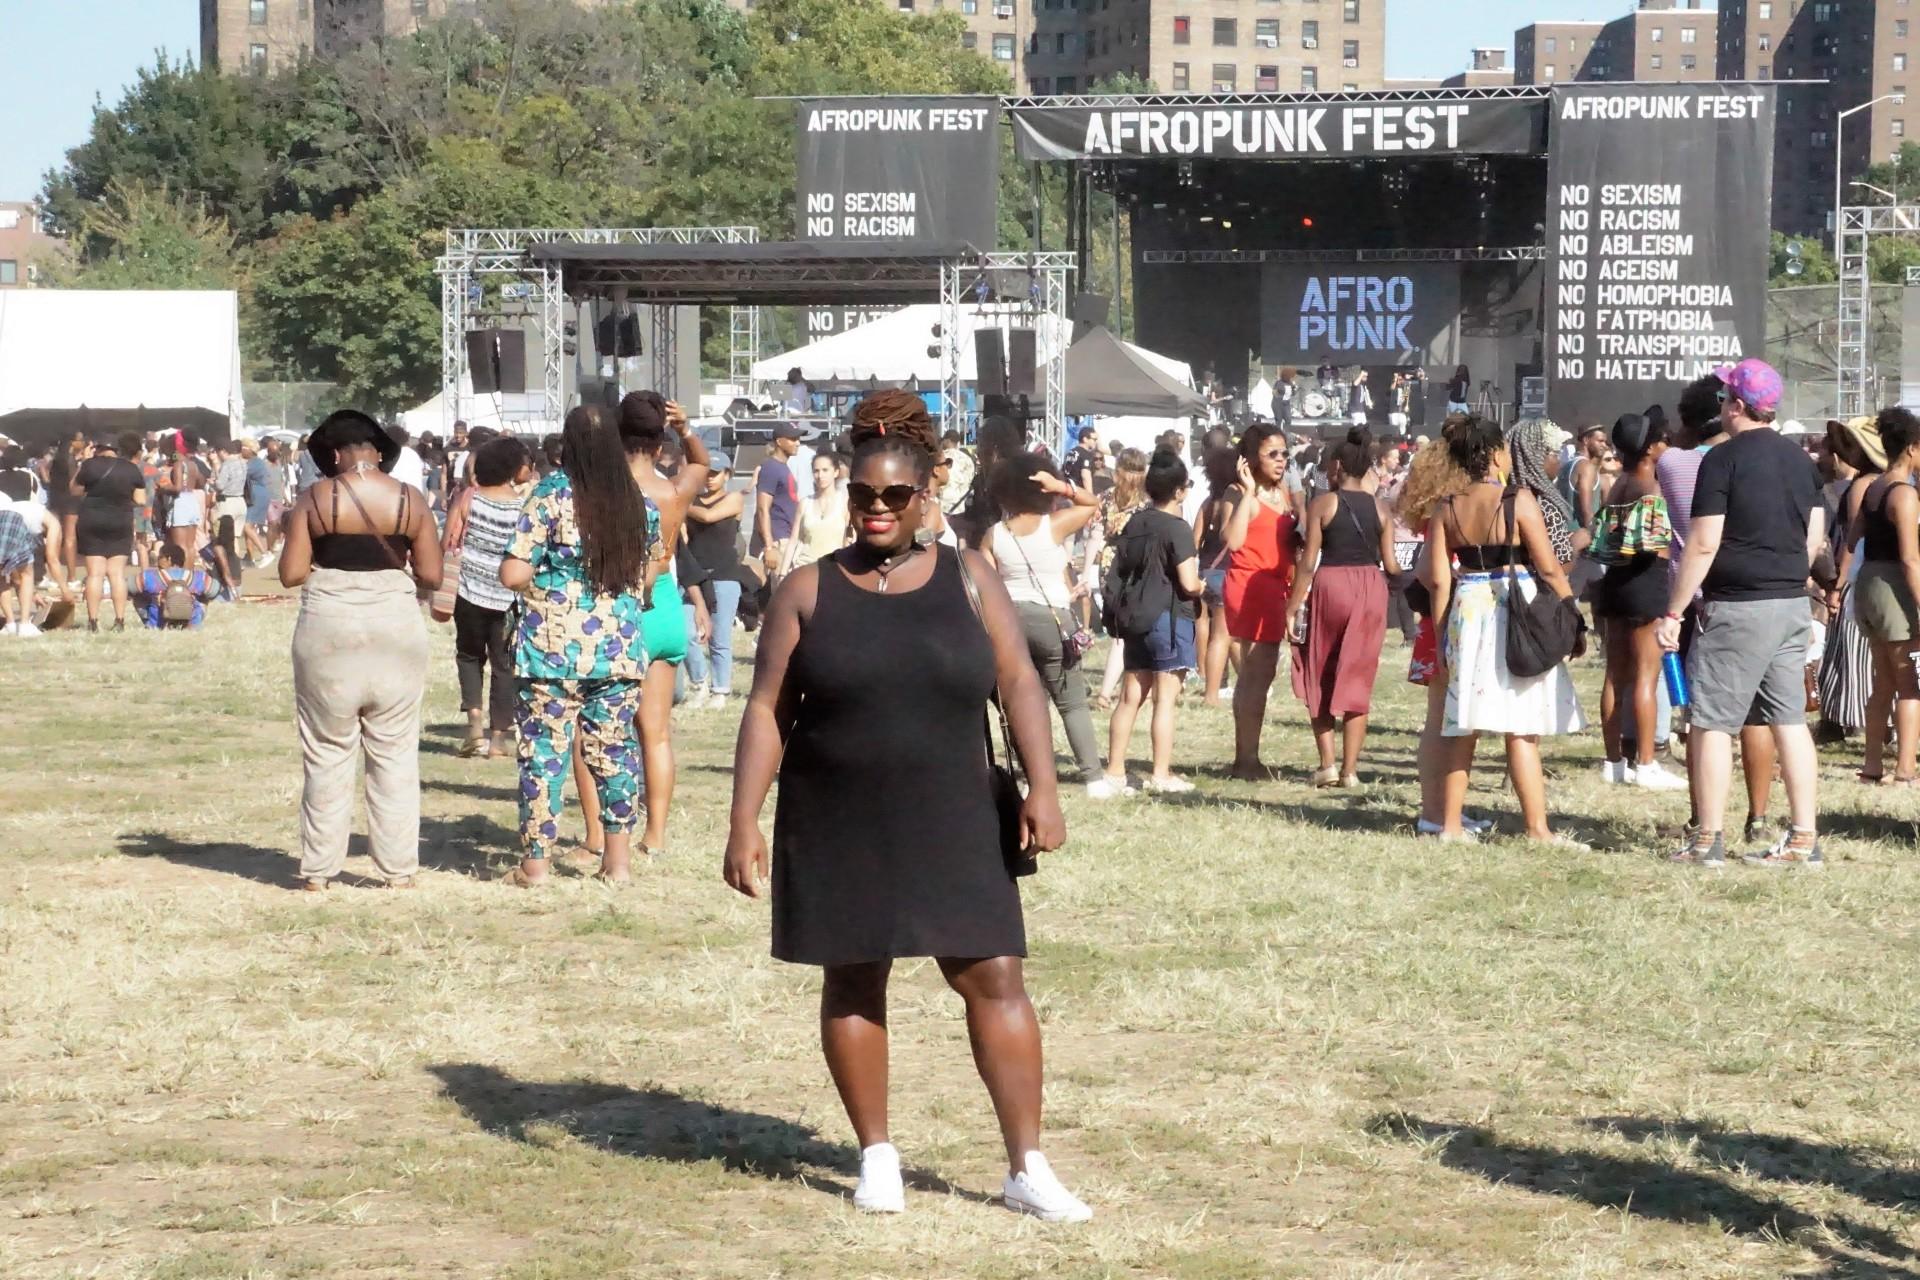 AFROPUNK FEST 2016